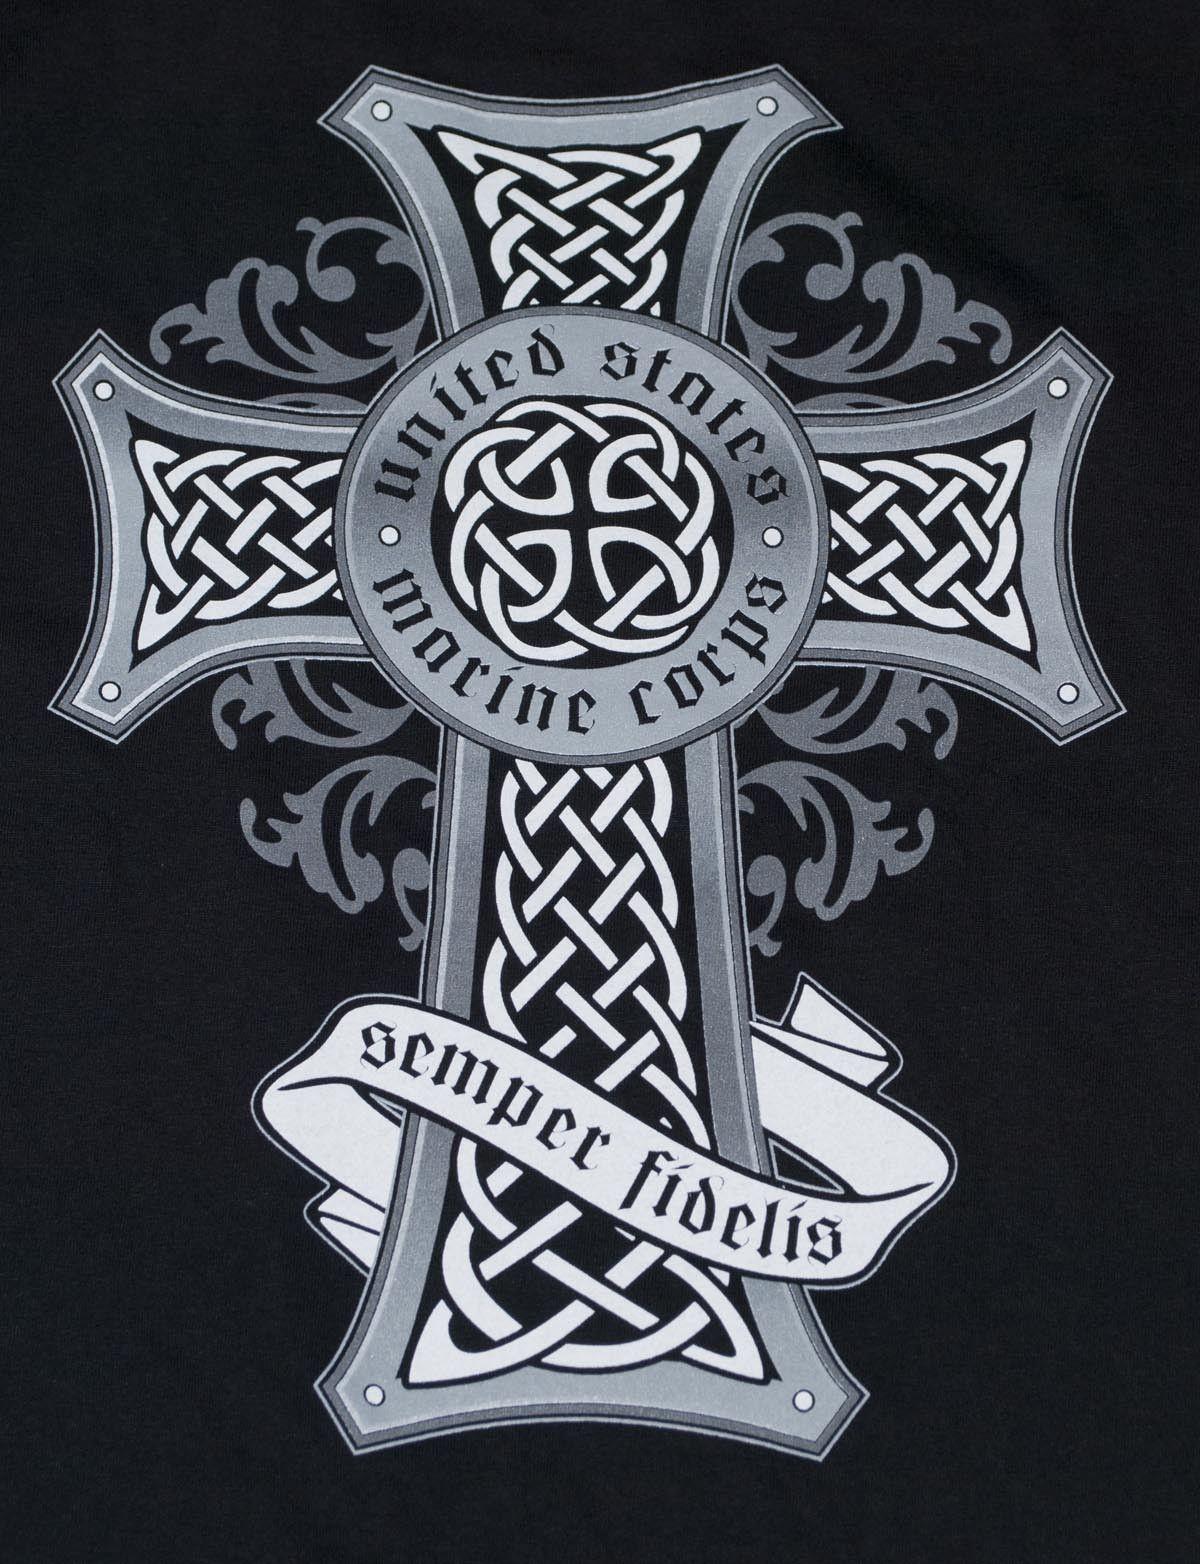 marine corps celtic cross black t shirt sgt grit marine corps store pics for wood shirts. Black Bedroom Furniture Sets. Home Design Ideas